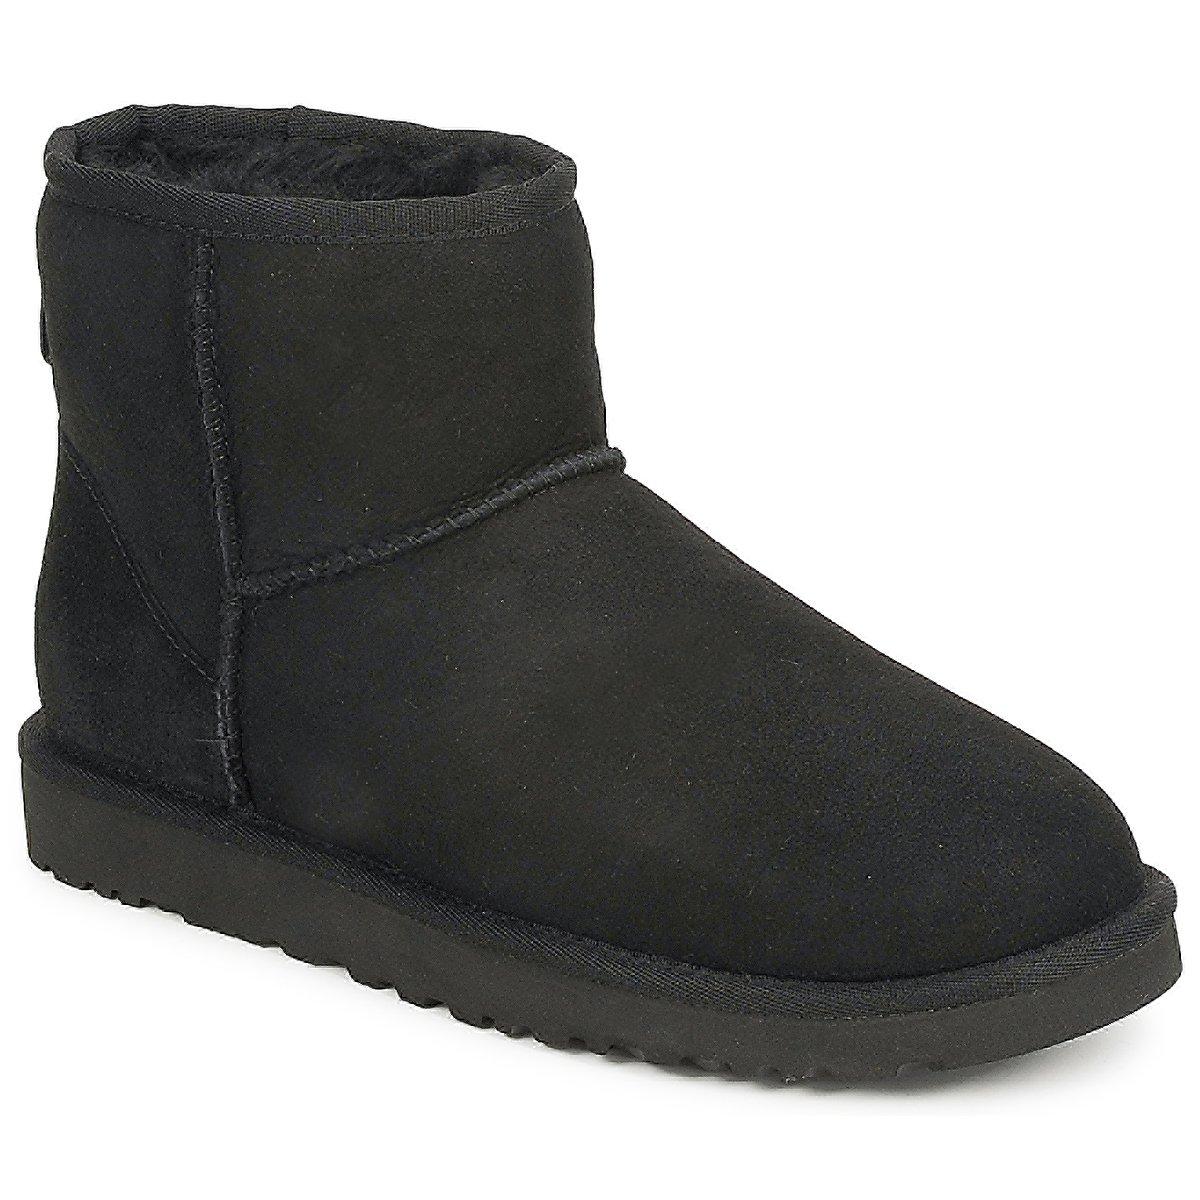 ugg boots classic mini black. Black Bedroom Furniture Sets. Home Design Ideas